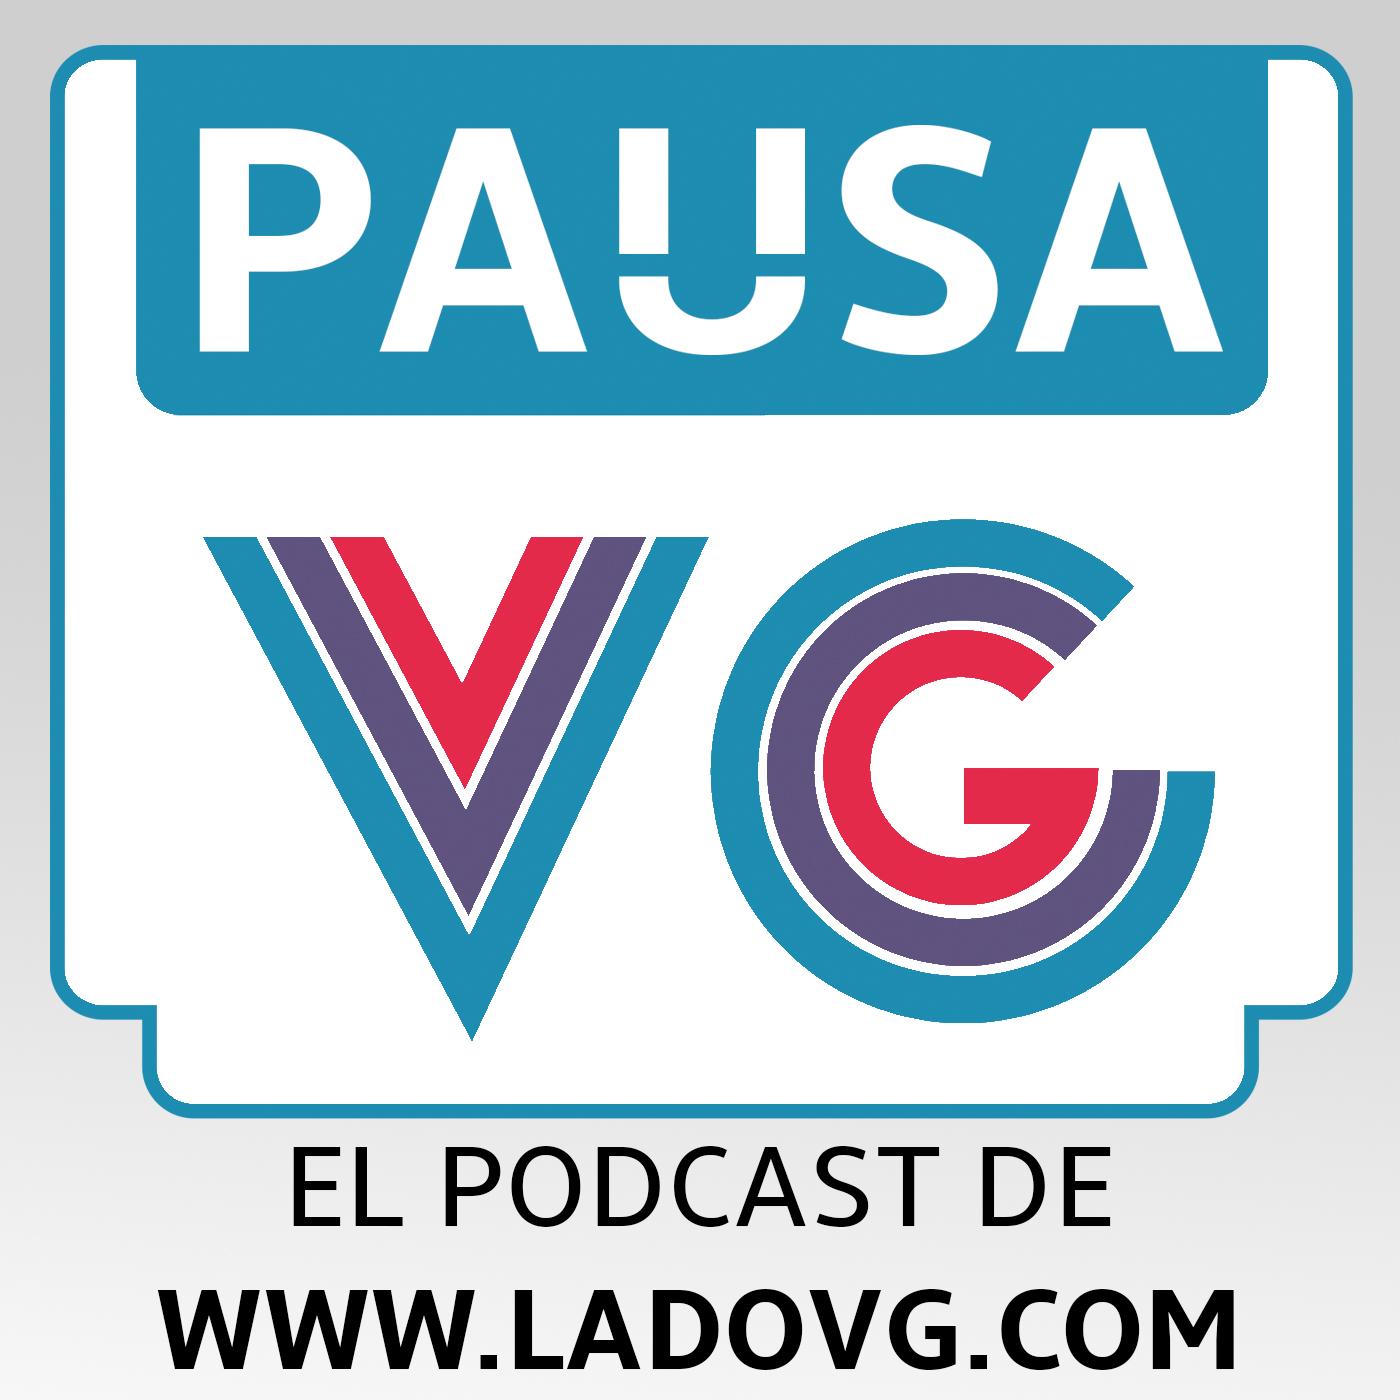 Pausa VG